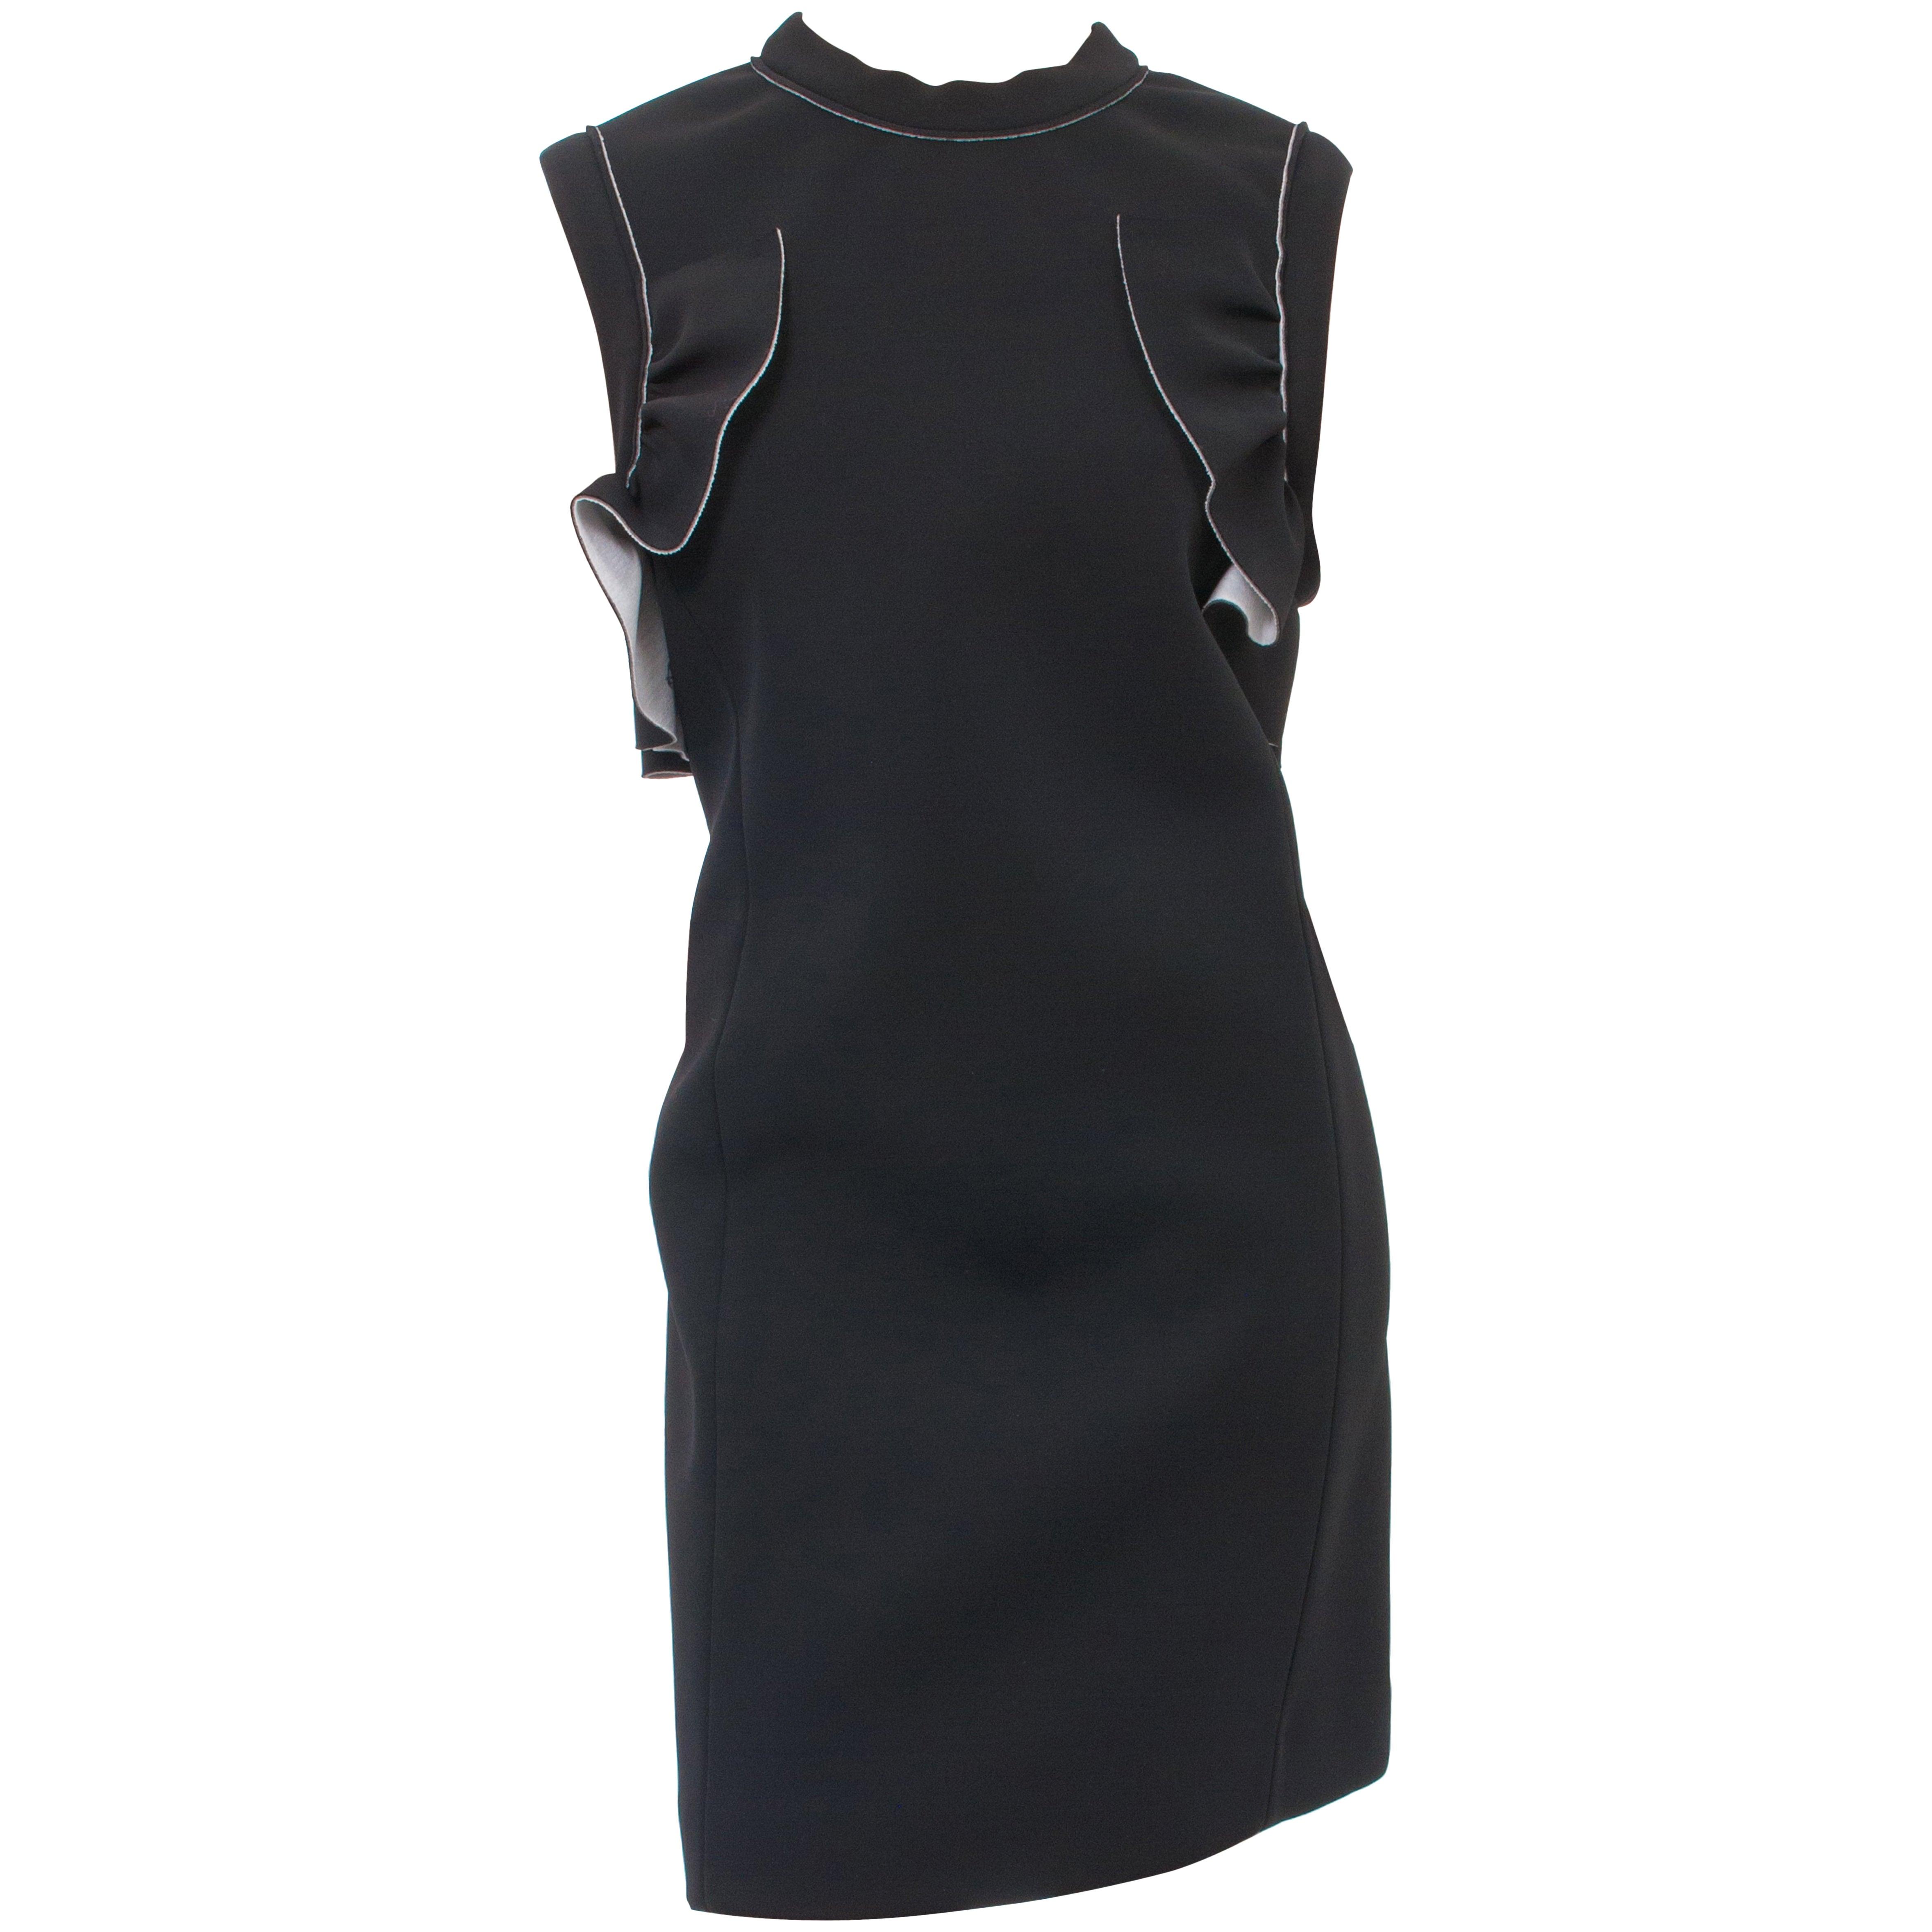 d7b4ca8ff03 Marni Black Neoprene Sleeveless Ruffle Dress at 1stdibs